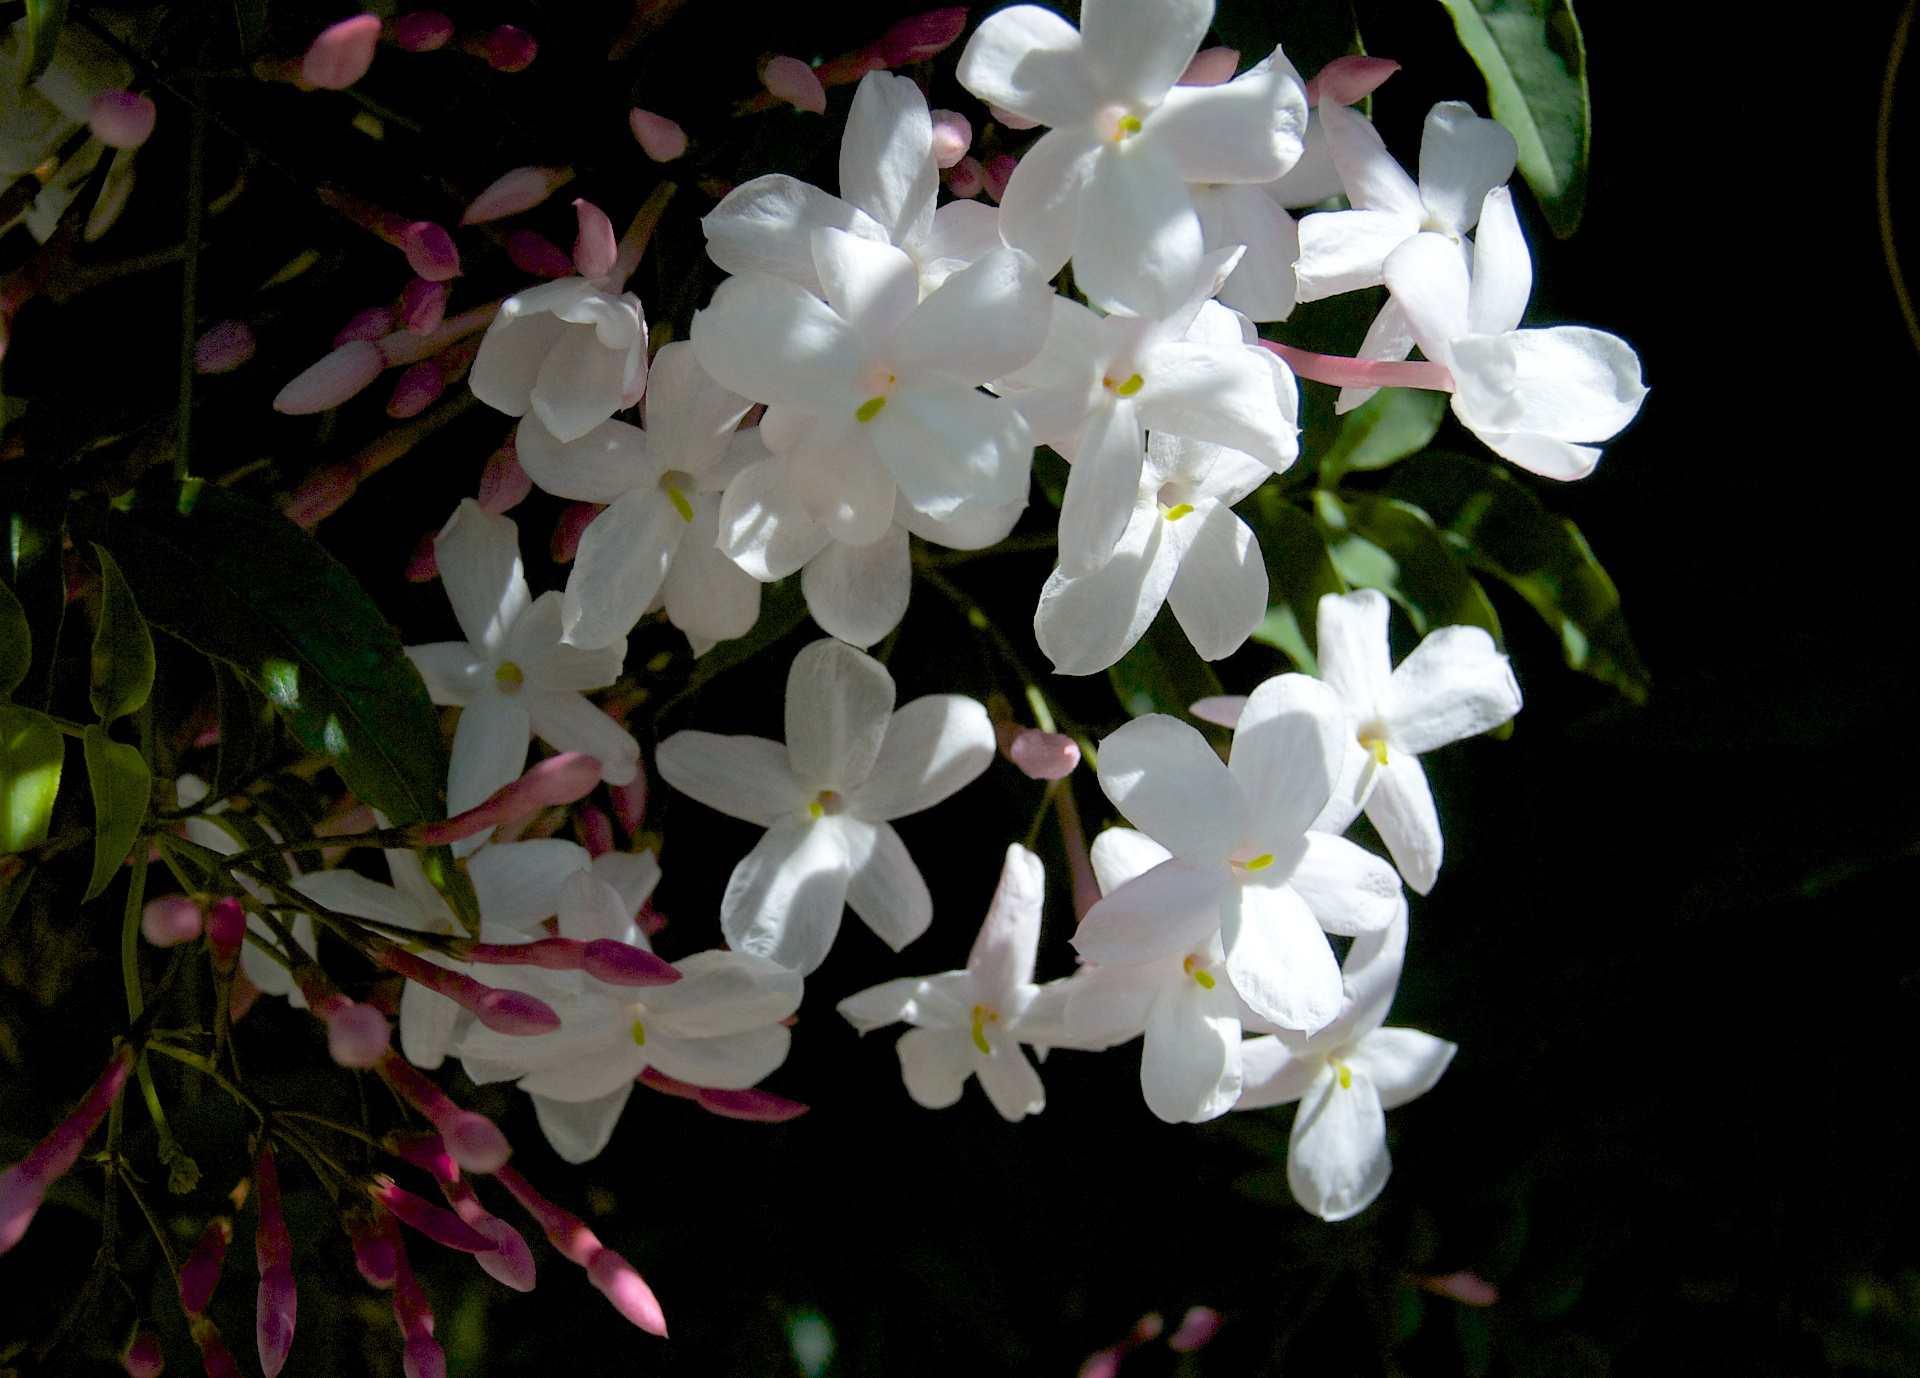 Комнатный жасмин мадагаскарский, многоцветковый, голоцветковый, желтый